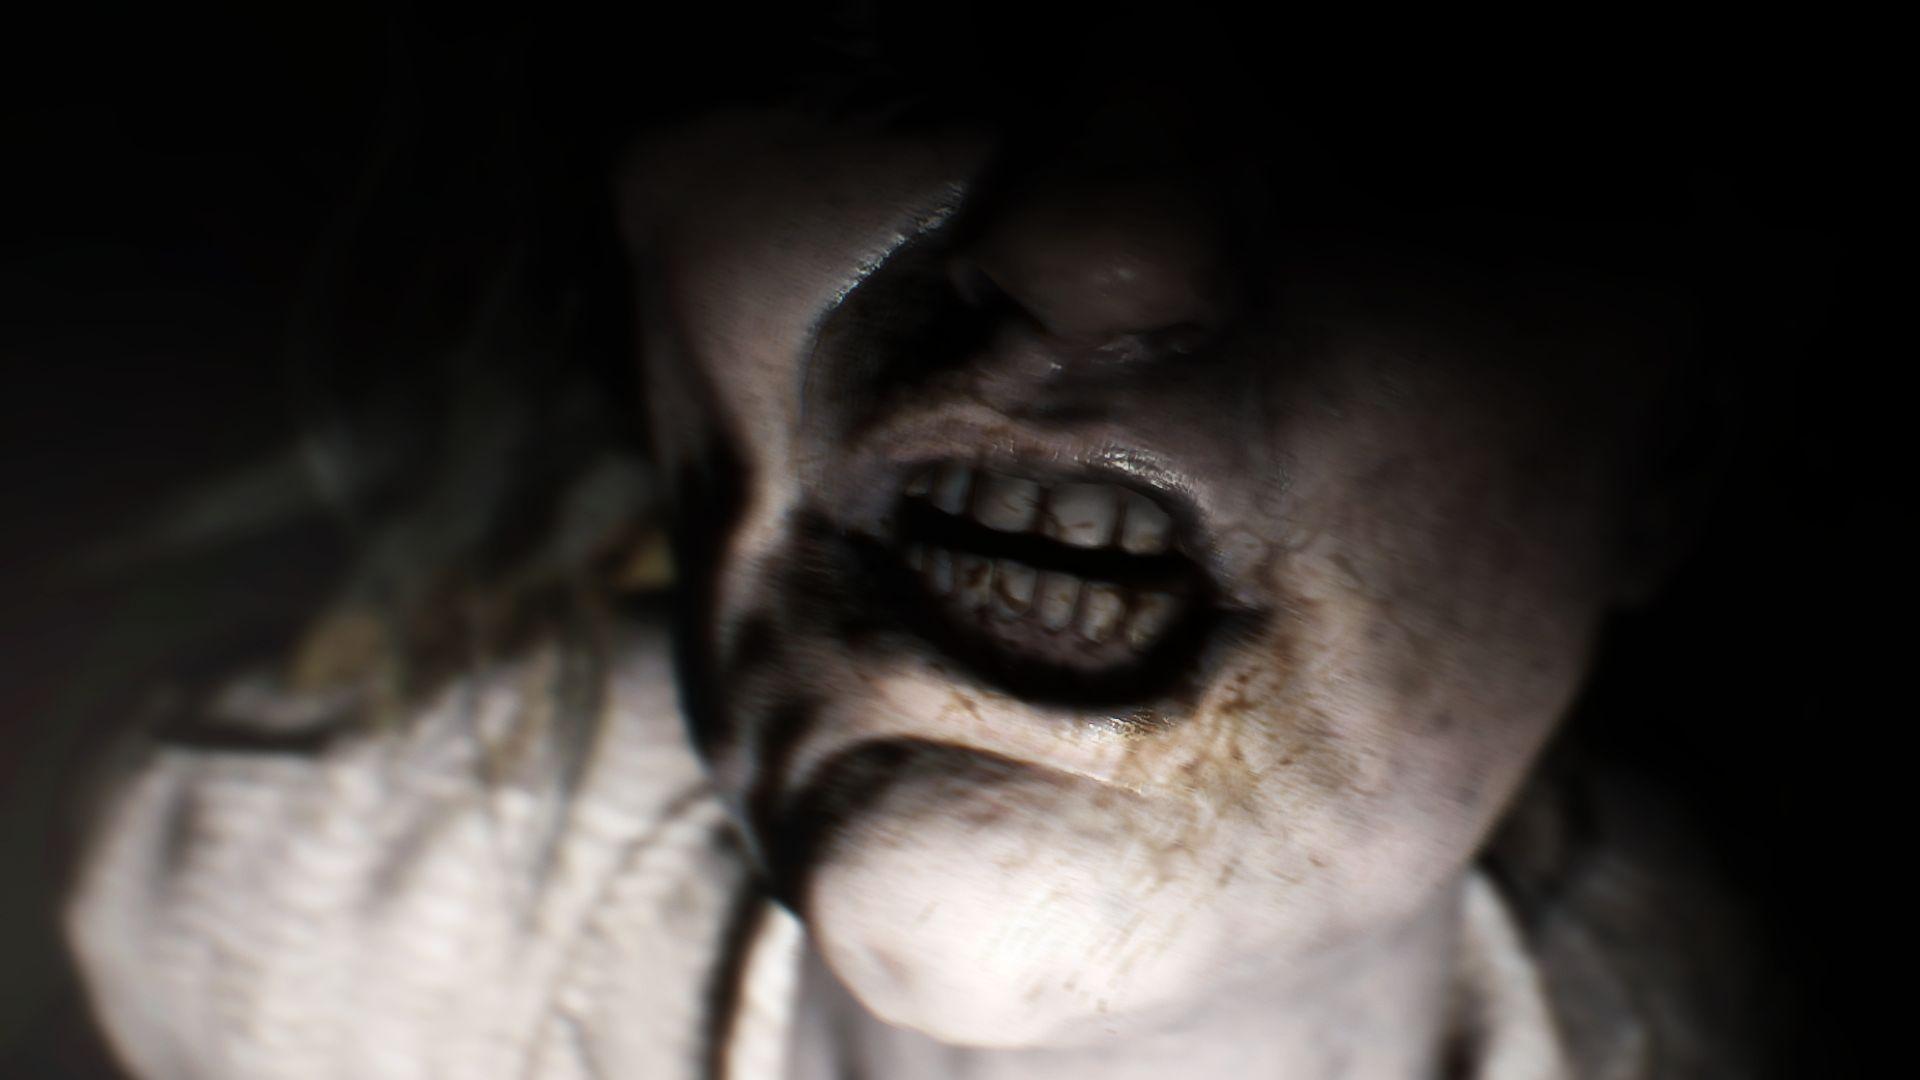 Capcom Releases New Resident Evil VII Biohazard Trailer And Story Details